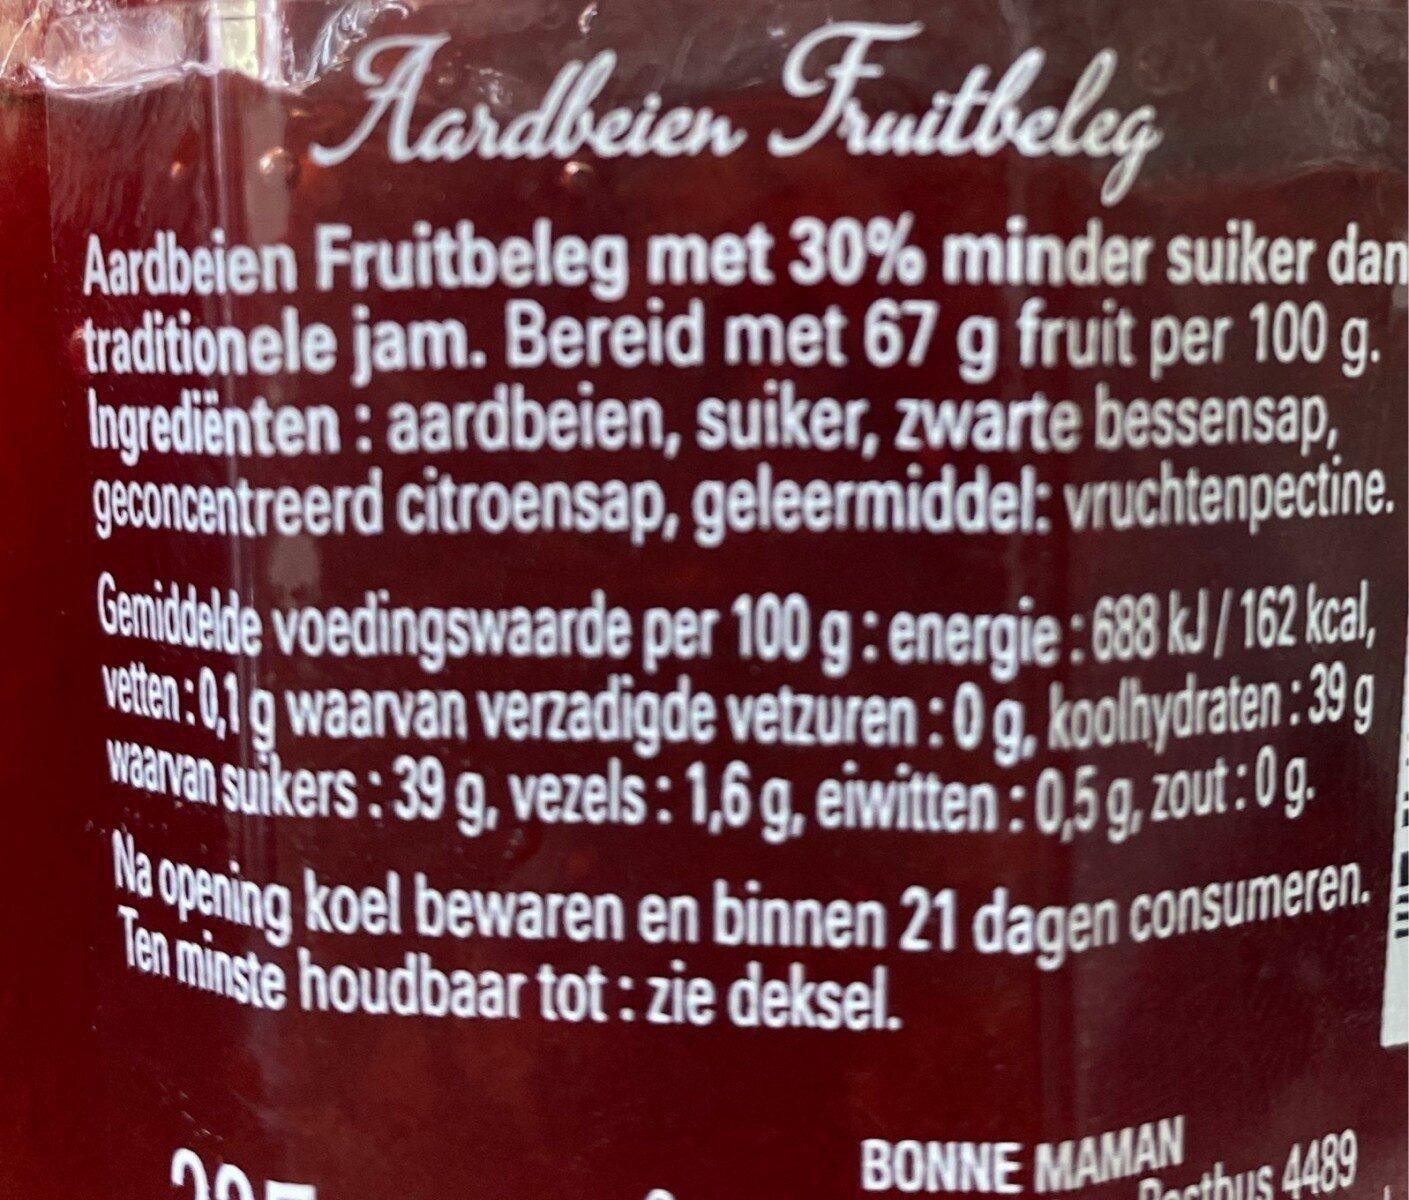 Bonne maman aardbeien meer fruit minder suiker - Nutrition facts - nl